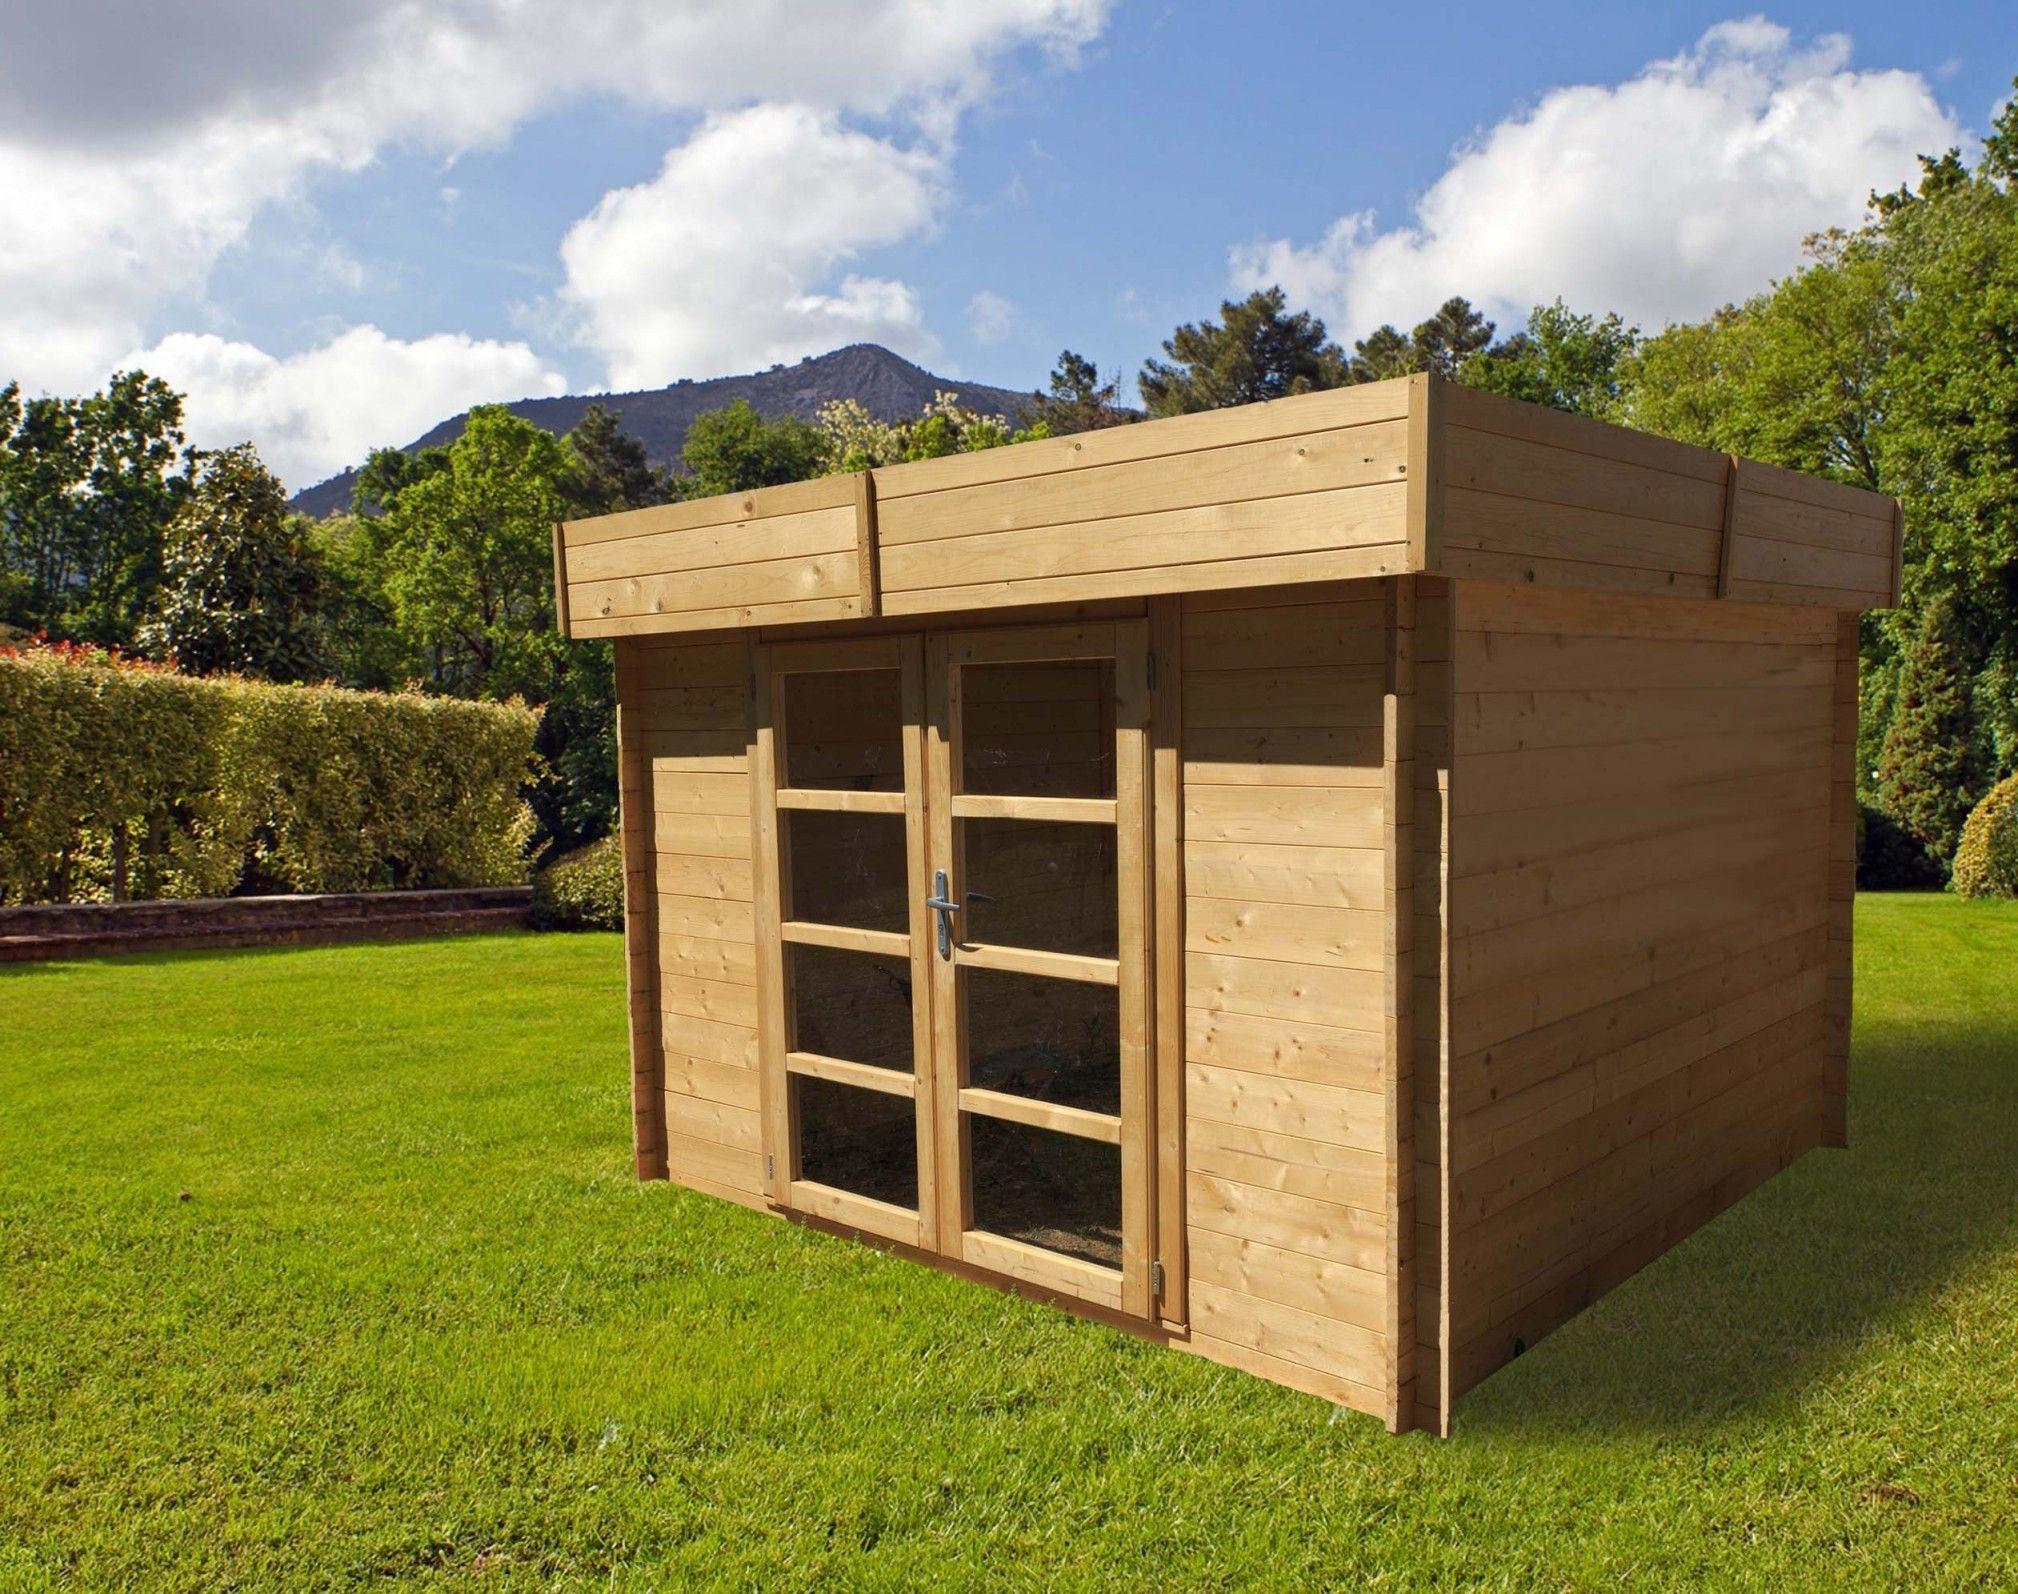 Abri Moto Bois Abri Moto Bois - Idees Conception Jardin à Abri Moto Jardin